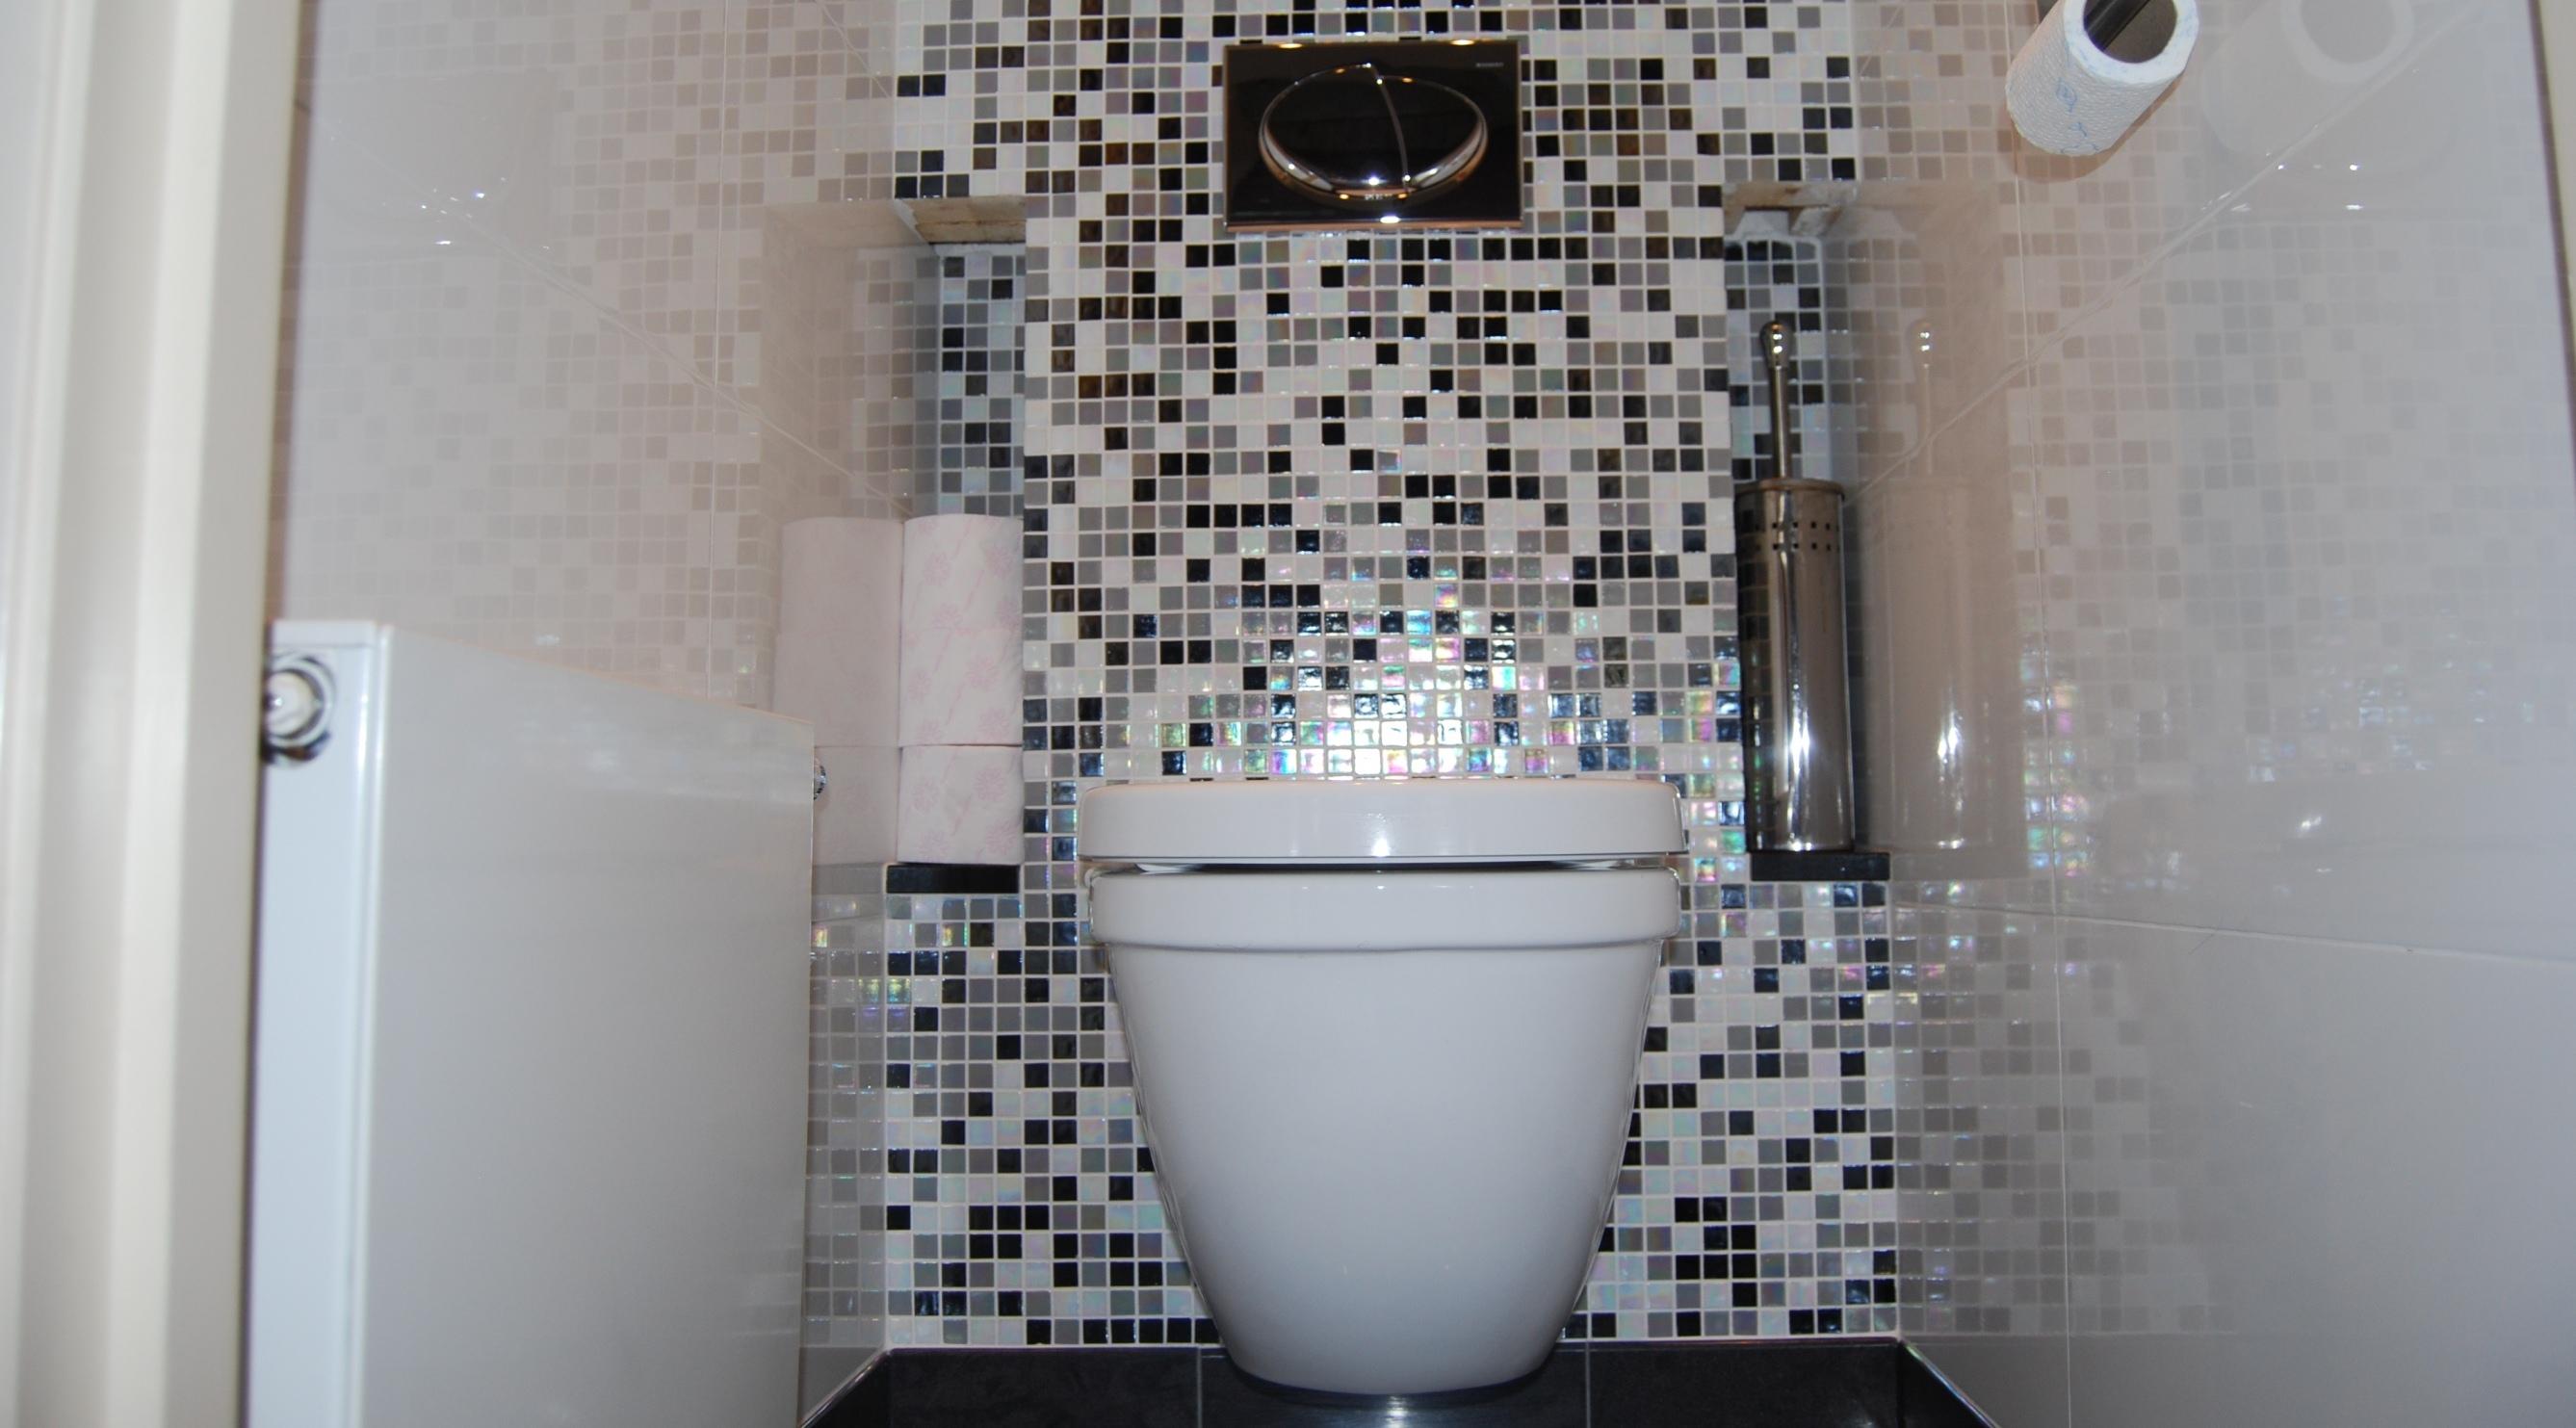 Badkamer toilet keuken verbouwen metsel en tegelbedr m lankreijer - Badkamer in m ...